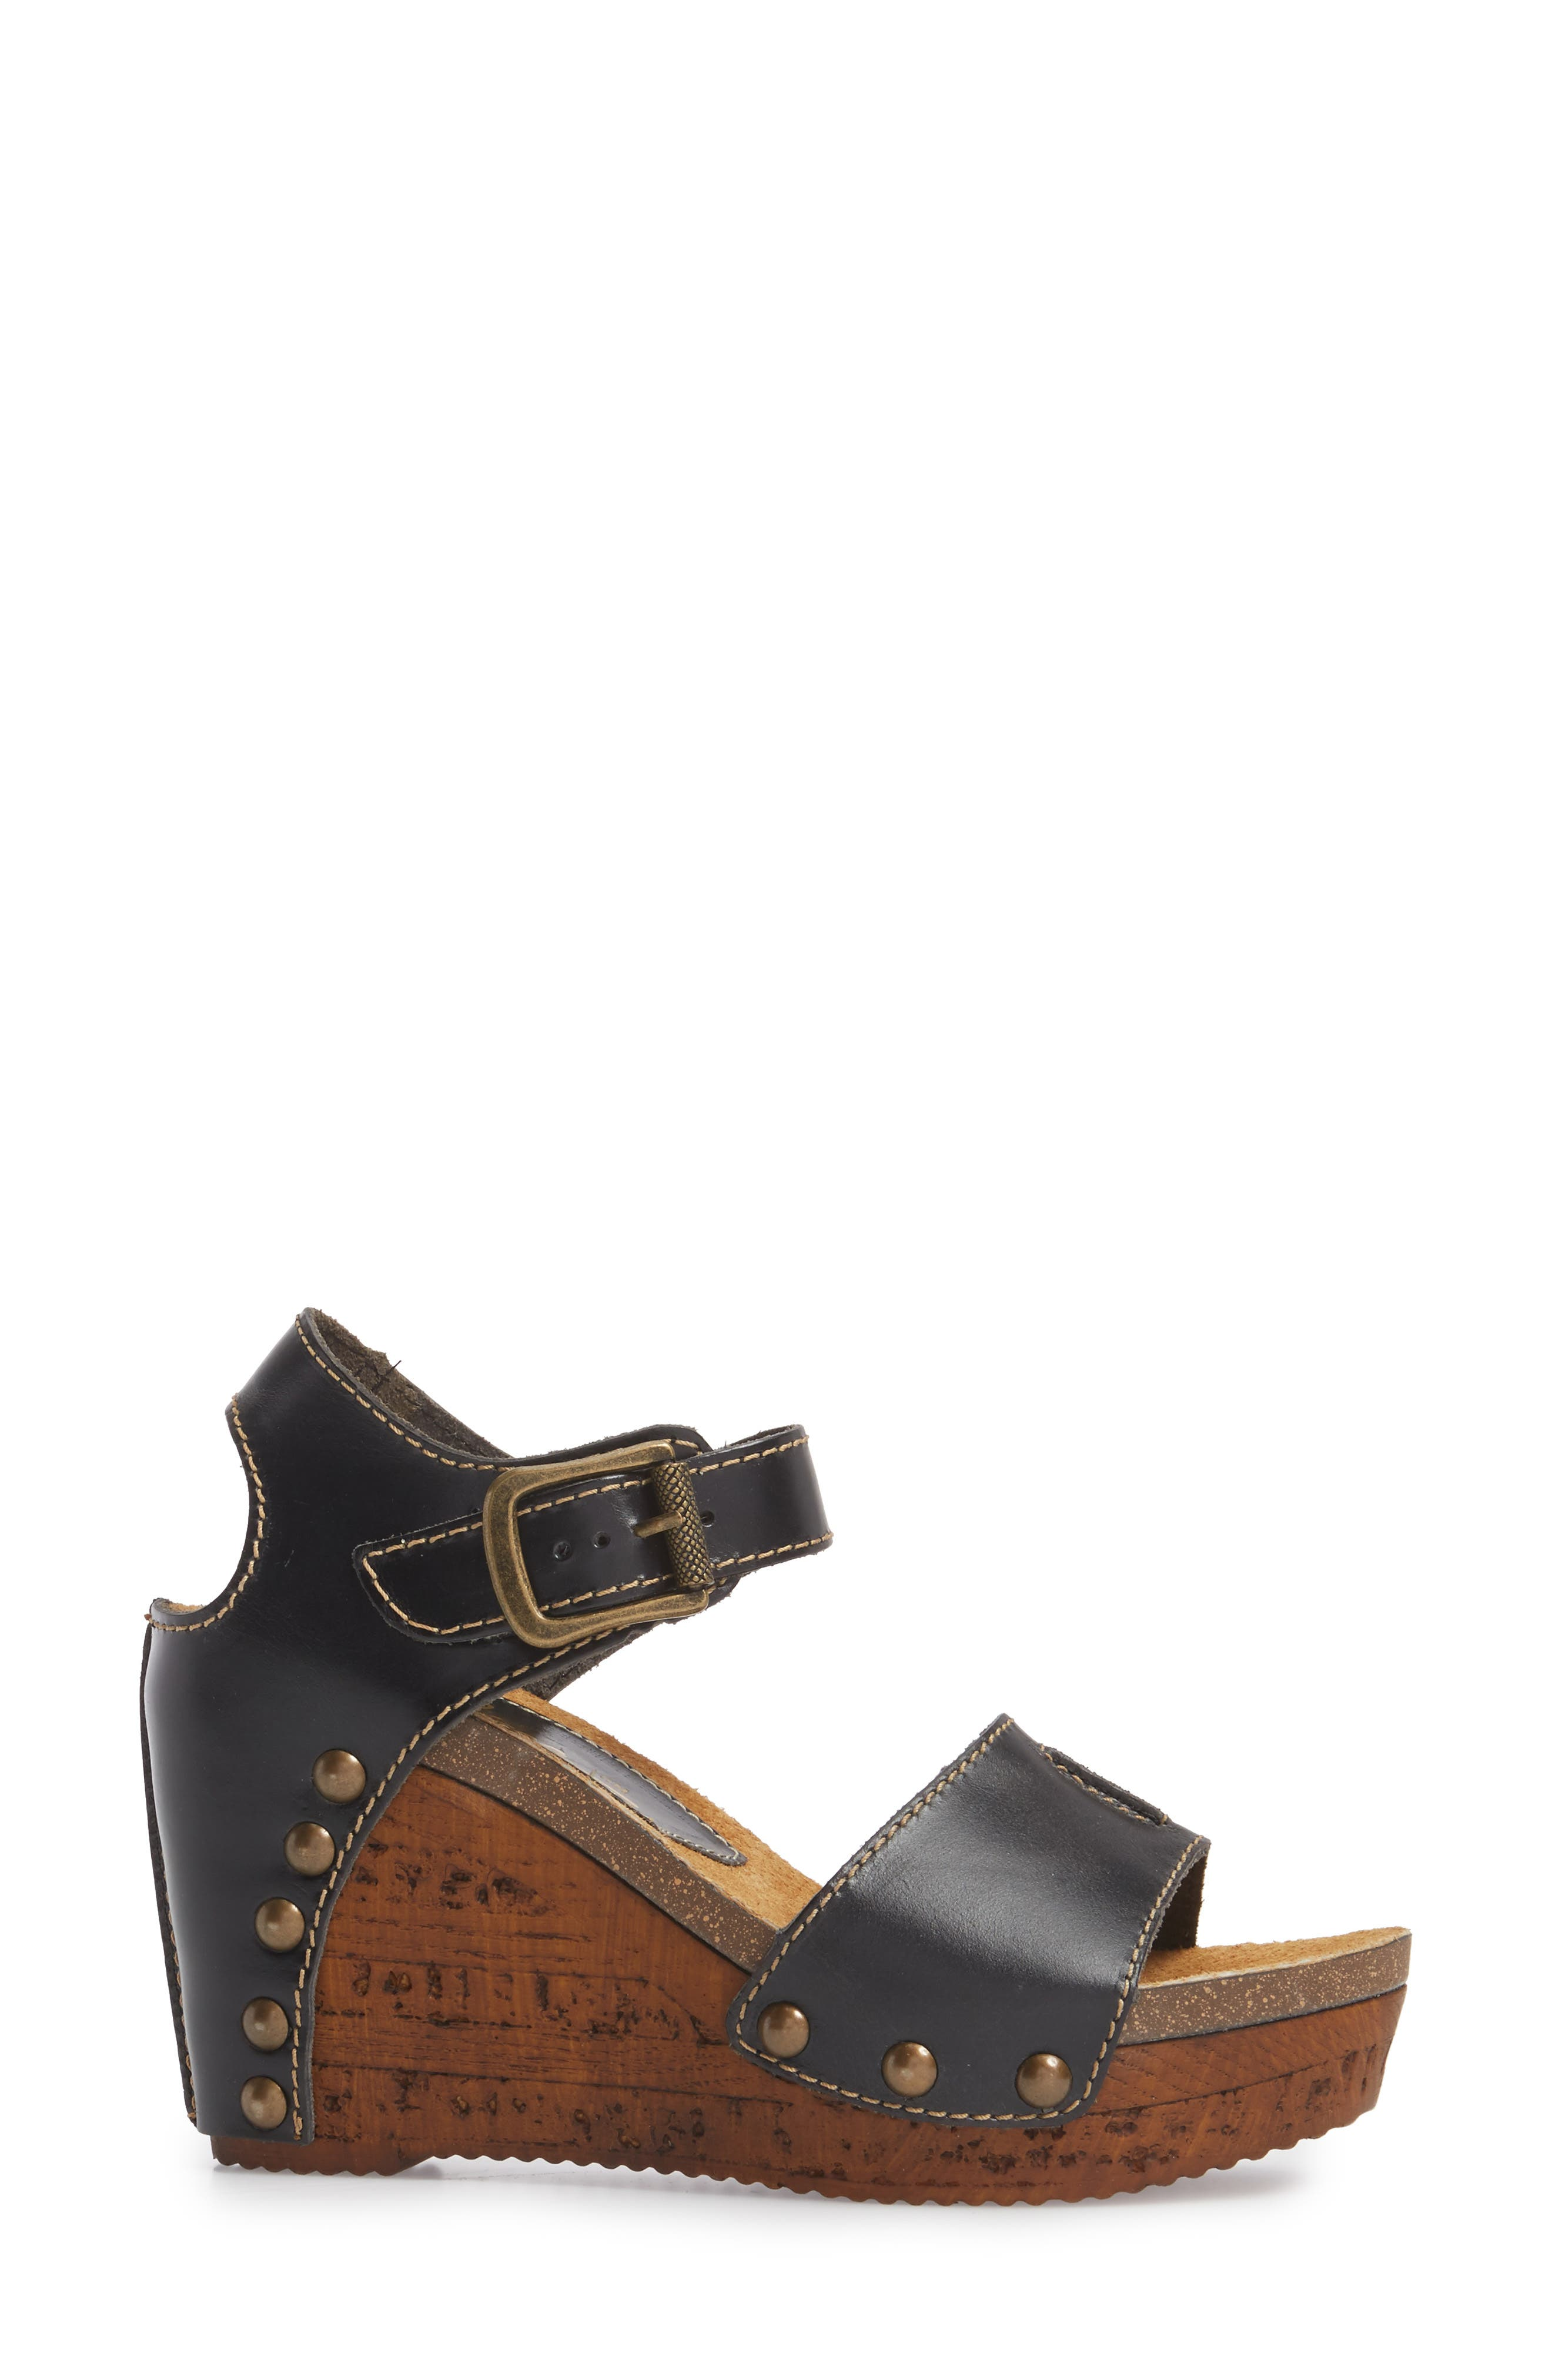 Brella Studded Platform Wedge Sandal,                             Alternate thumbnail 3, color,                             BLACK